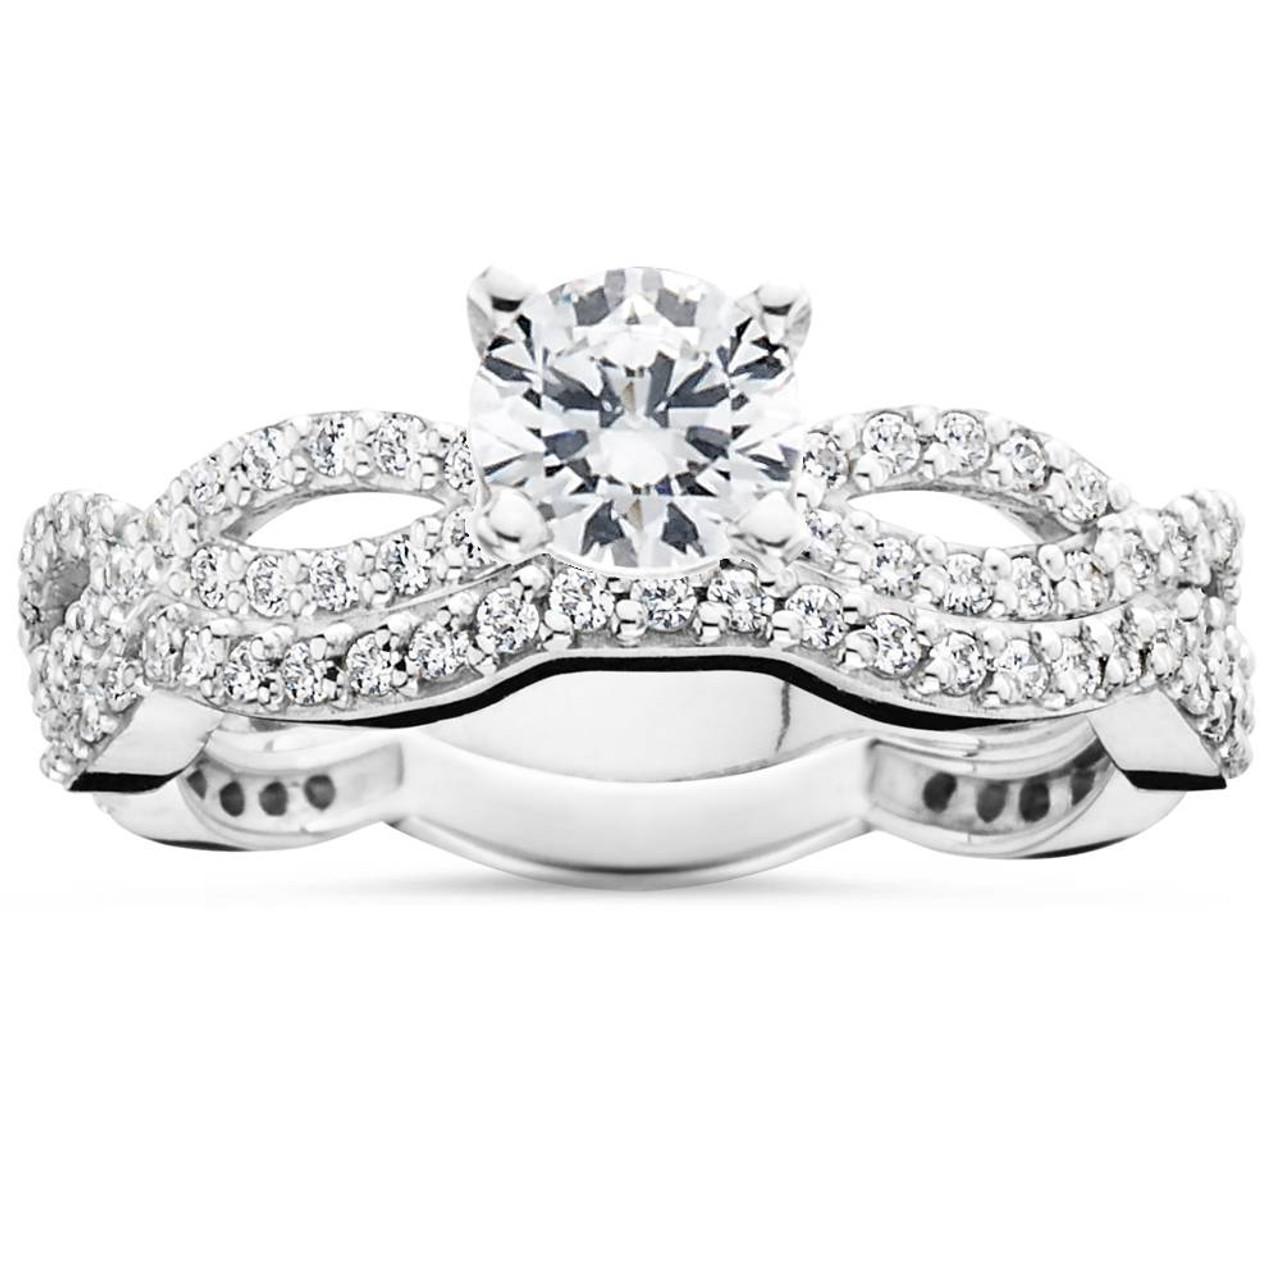 1ct Pave Natural Diamond Engagement Infinity Wedding Ring Set 14K ...